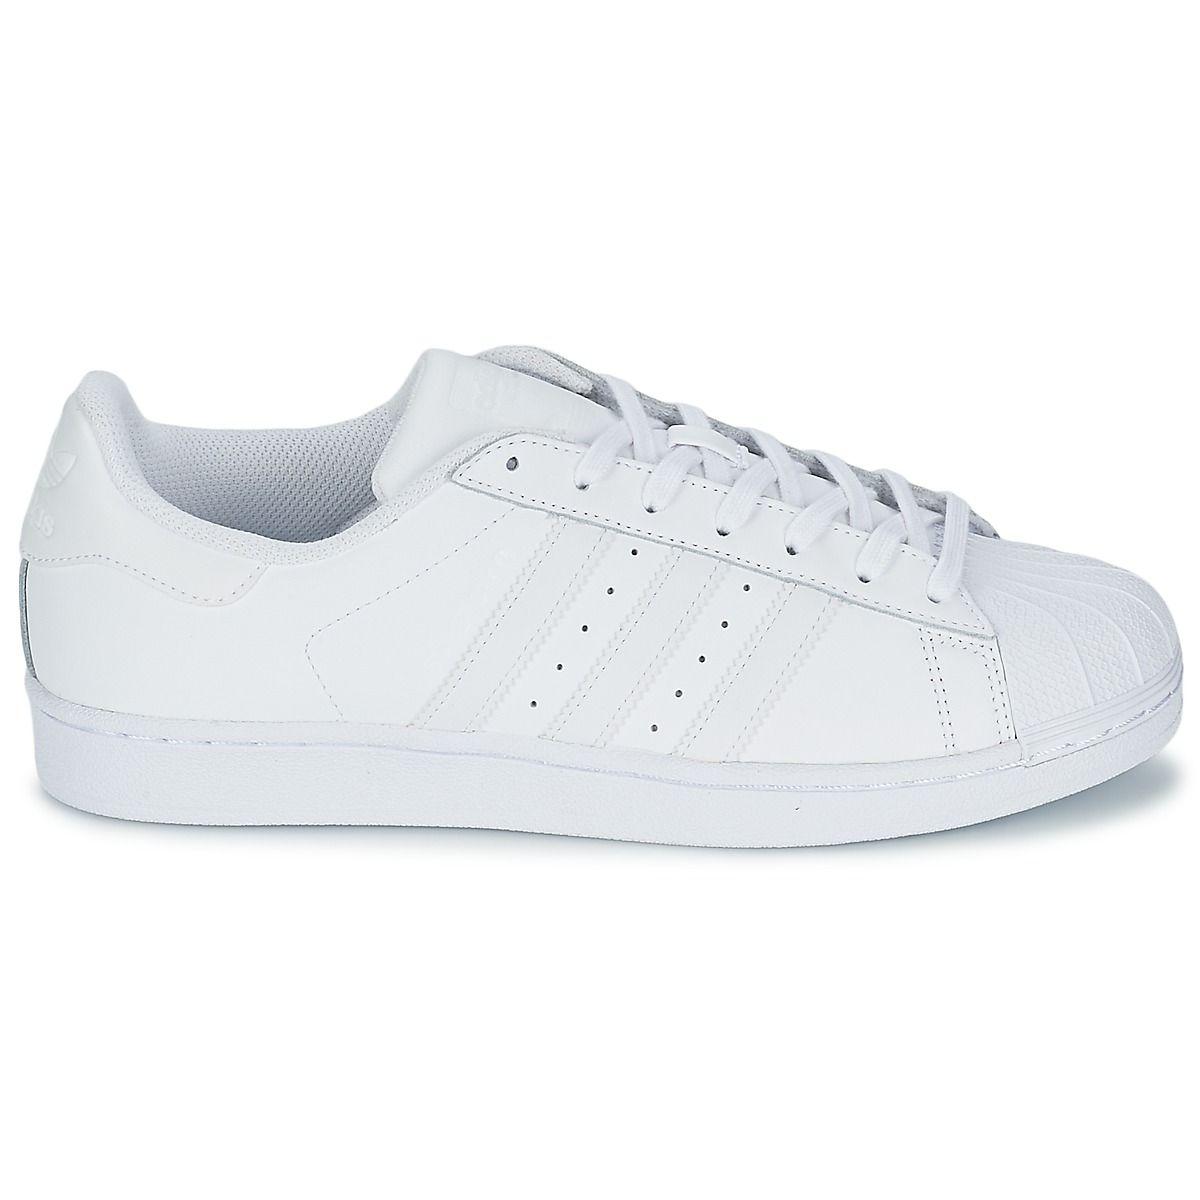 Adidas Originals FOUNDATION Sneakers SUPERSTAR FOUNDATION Originals Bianco Women 284ba5